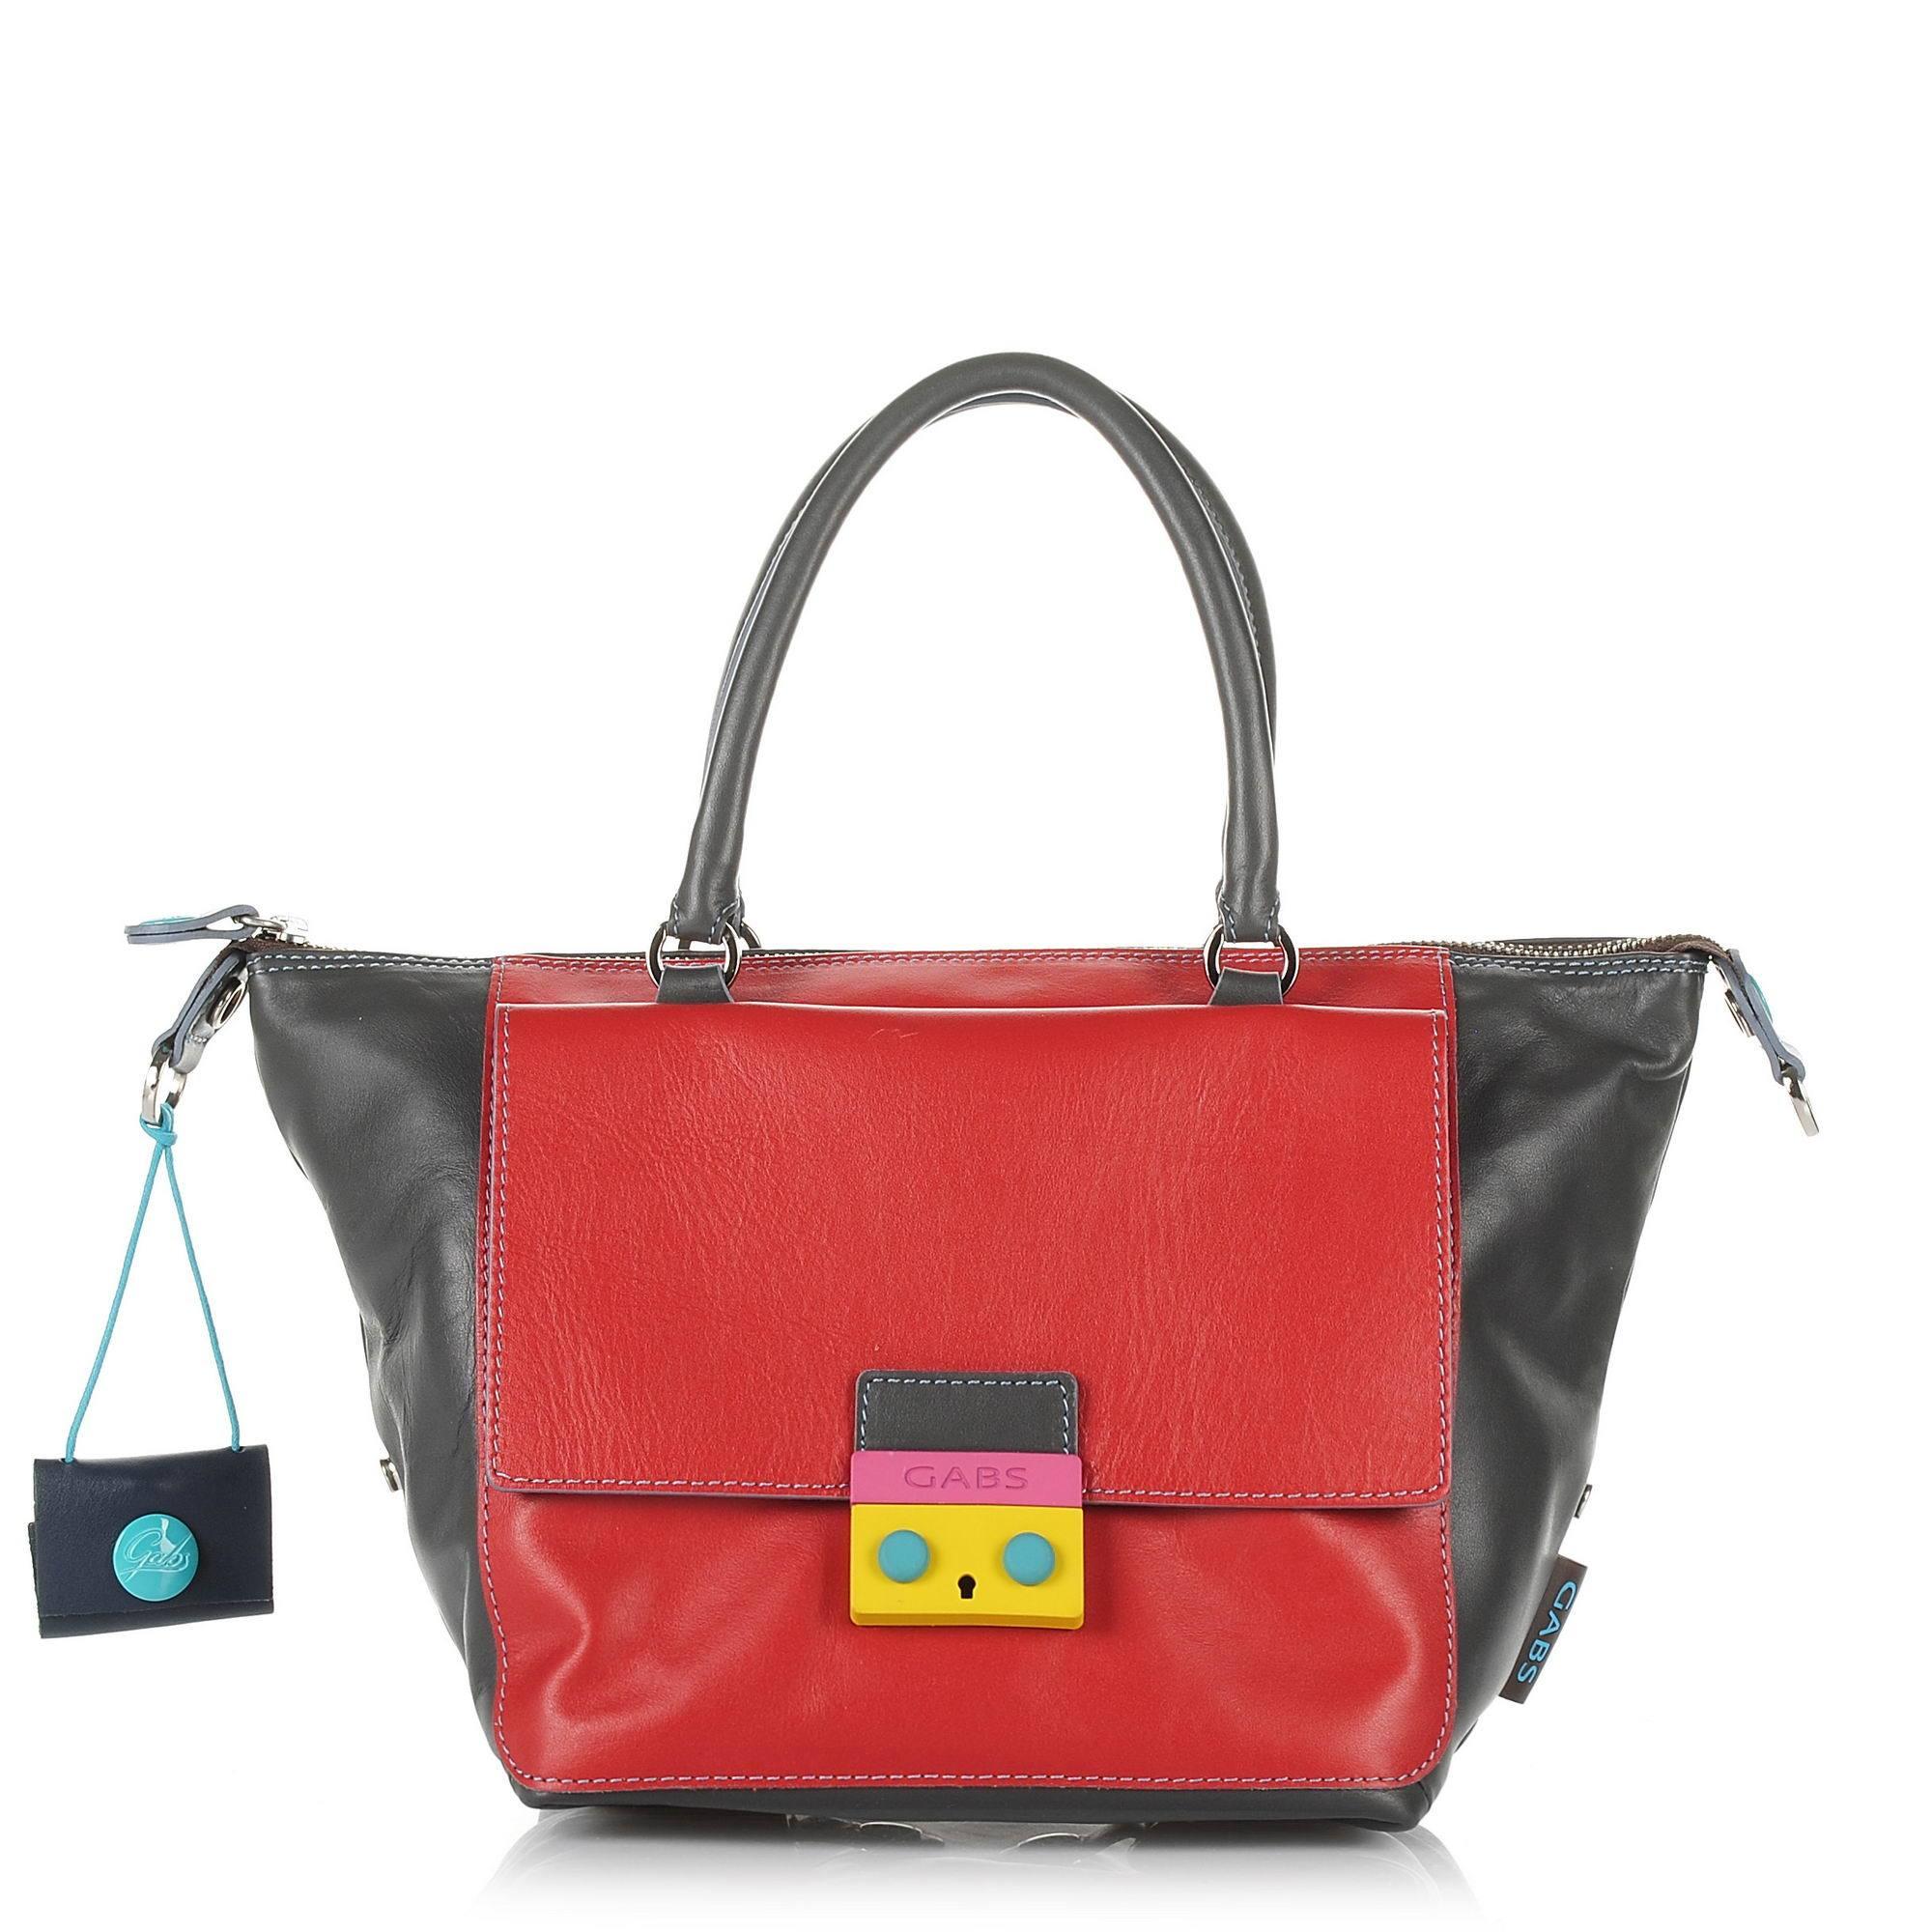 Tote Τσάντα Gabs Chiara-I16 Bic γυναικα   γυναικεία τσάντα